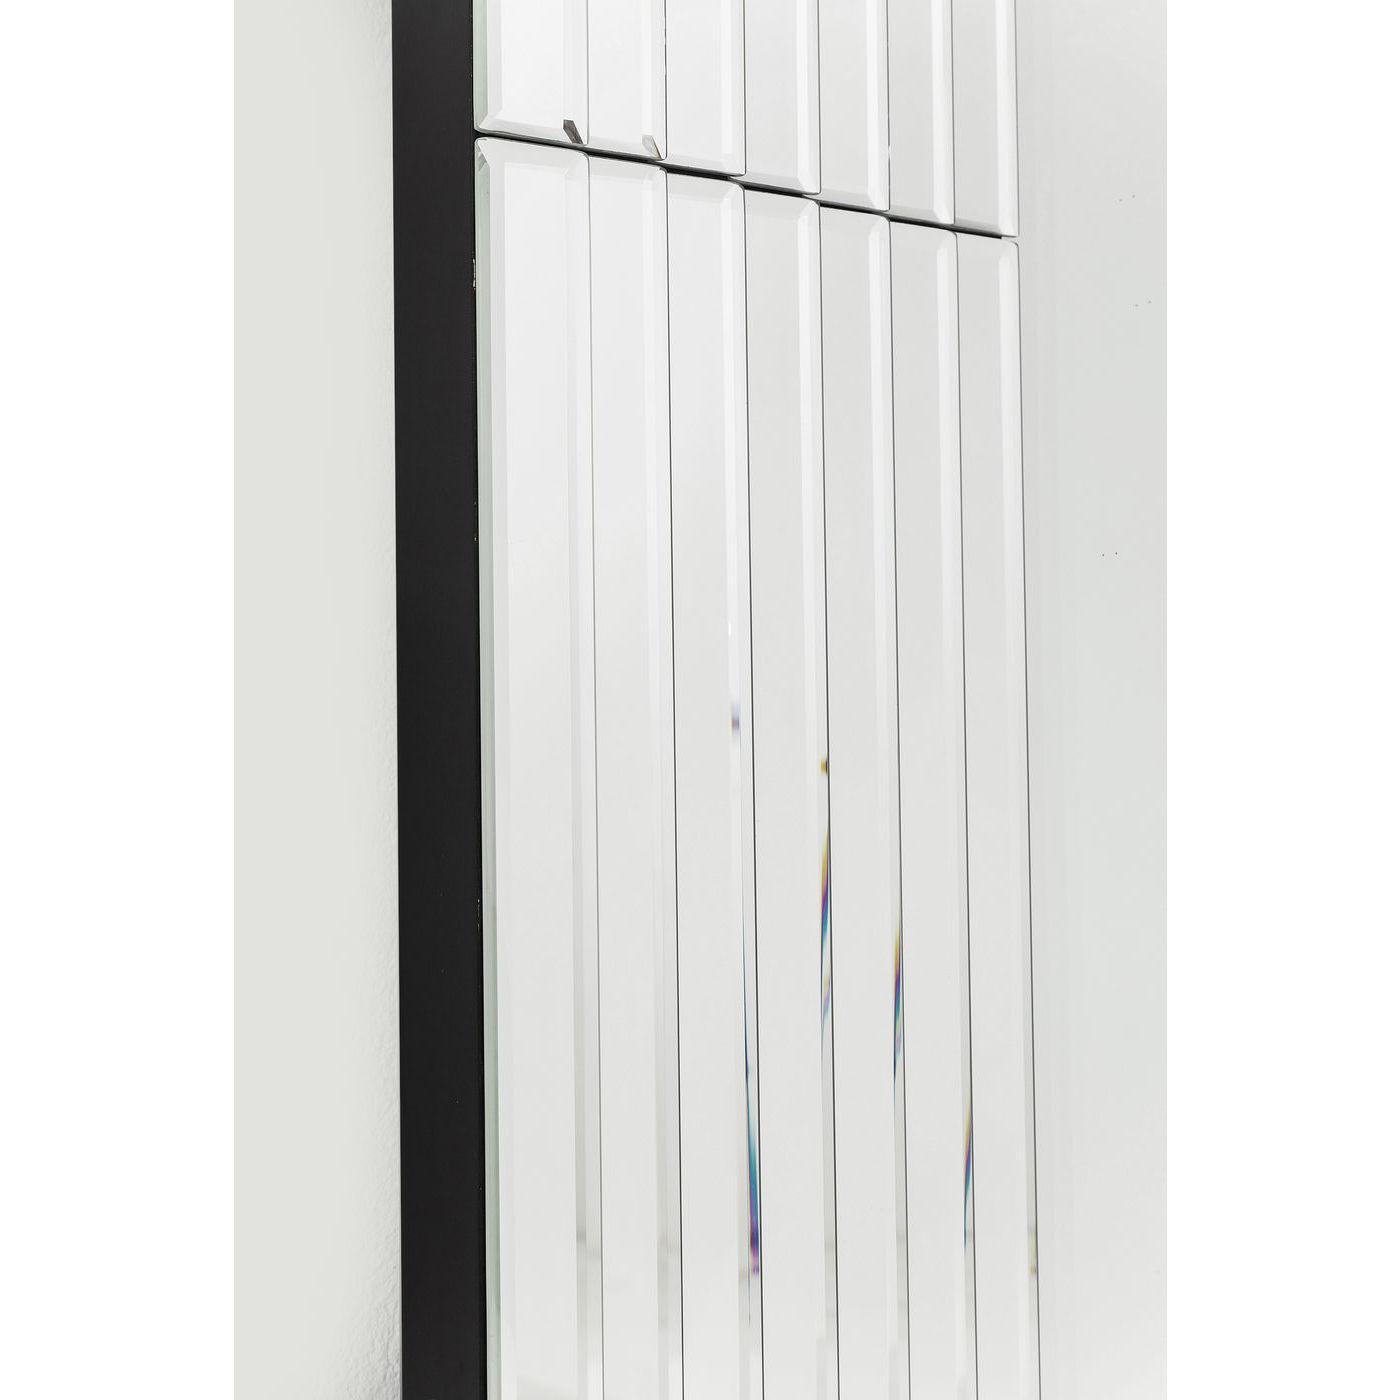 Image of   KARE DESIGN Spejl, Linea 200x100cm